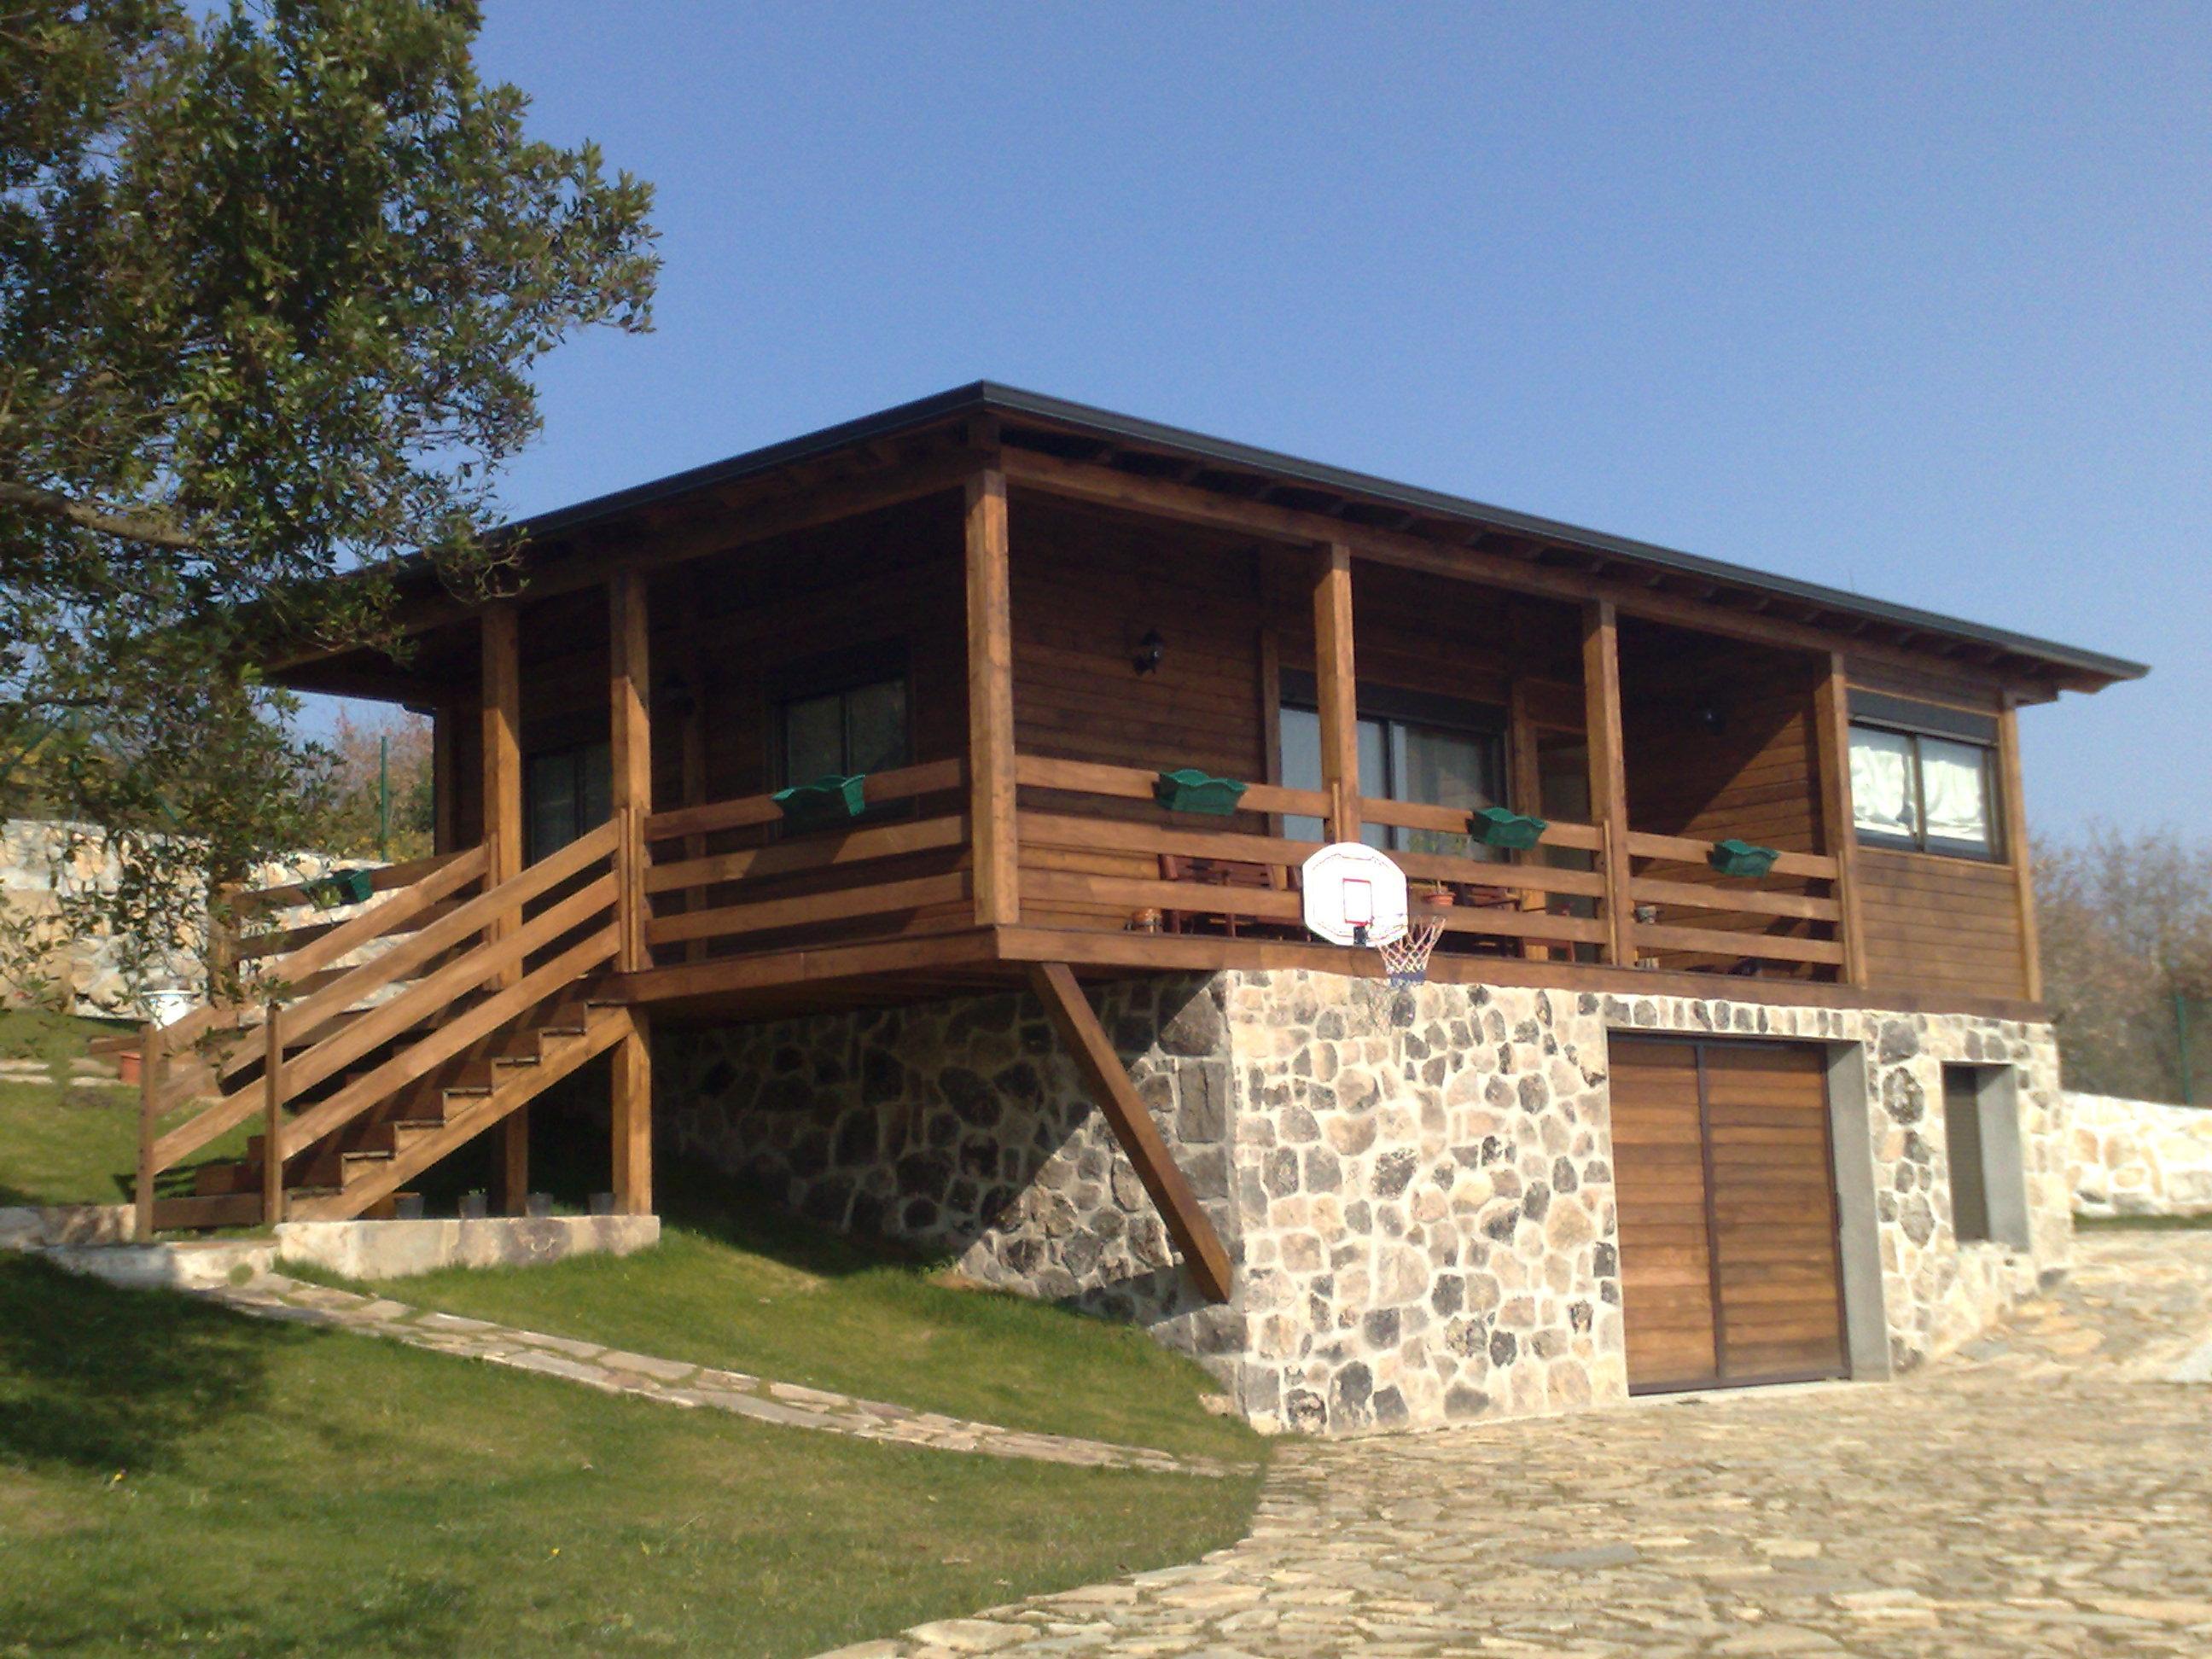 Casas de madera bungalows caba as - Bungalows de madera prefabricadas precios ...